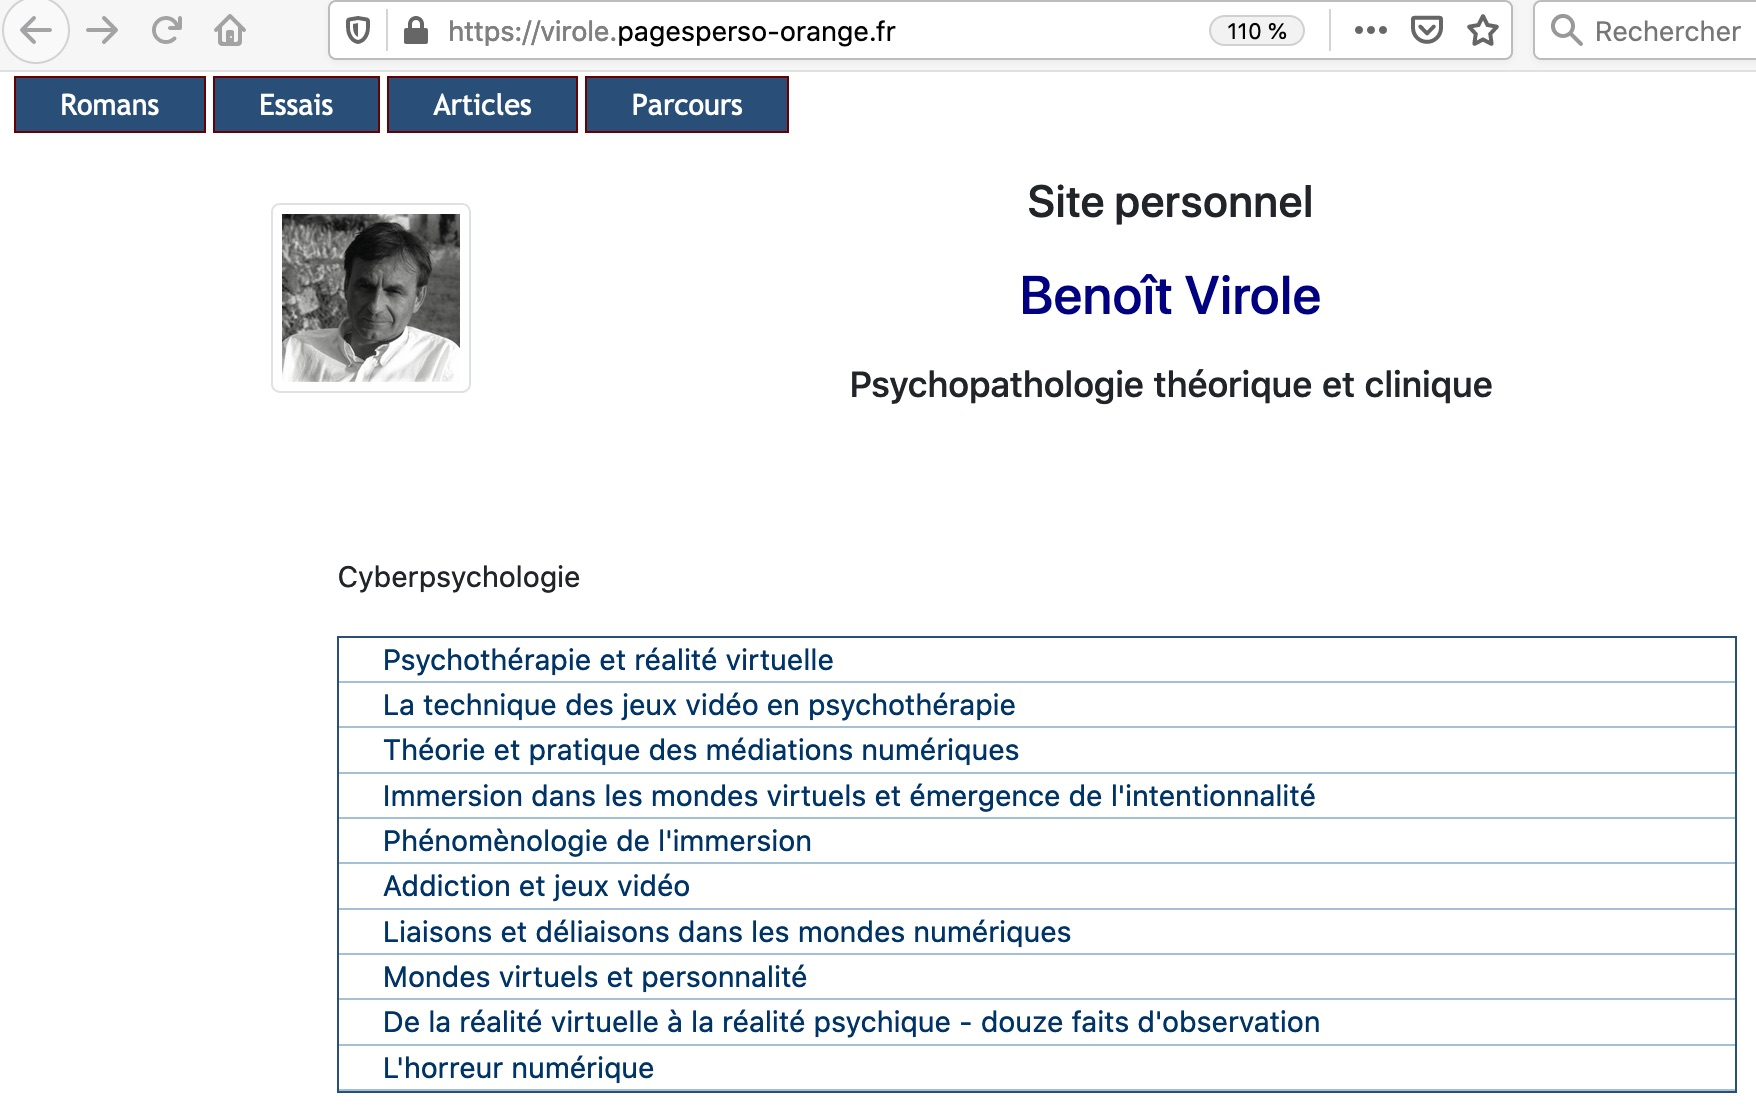 Benoît Virole – Cyberpsychologie